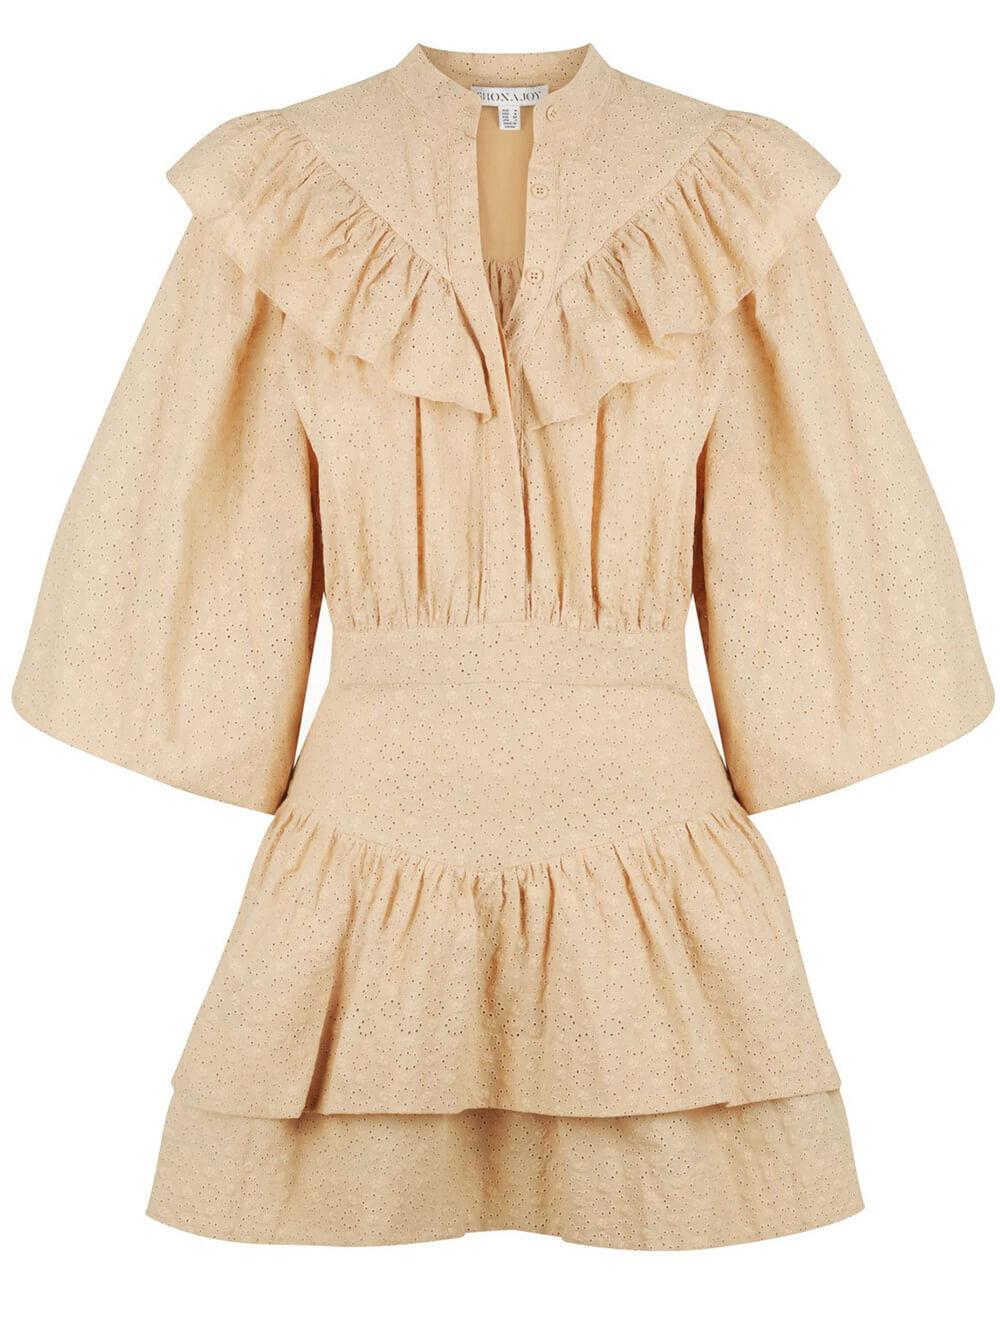 Magnolia Mini Dress Item # 213157